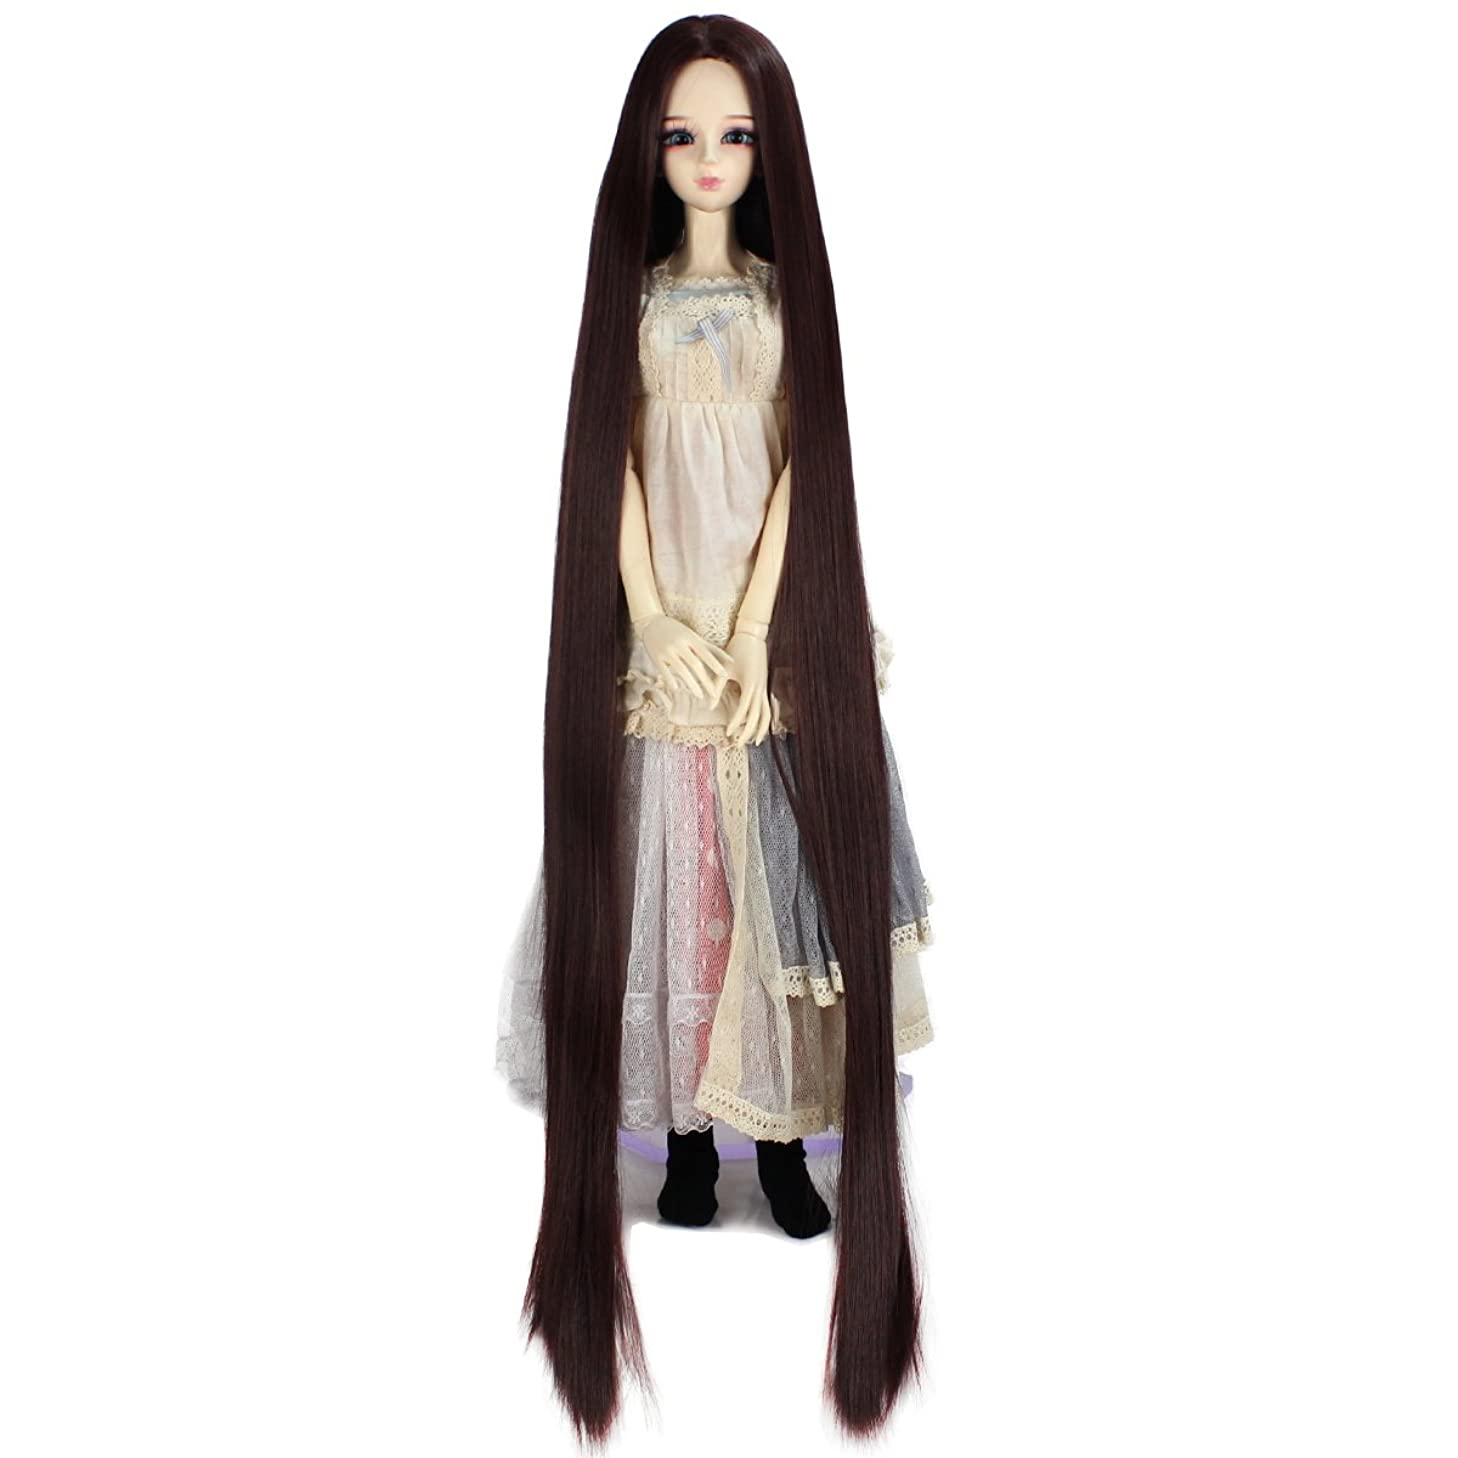 Miss U Hair 9-10 Inch 1/3 Extra Long Straight Hair BJD MSD DOD Pullip Dollfie Doll Wig Not for Human (Dark brown)